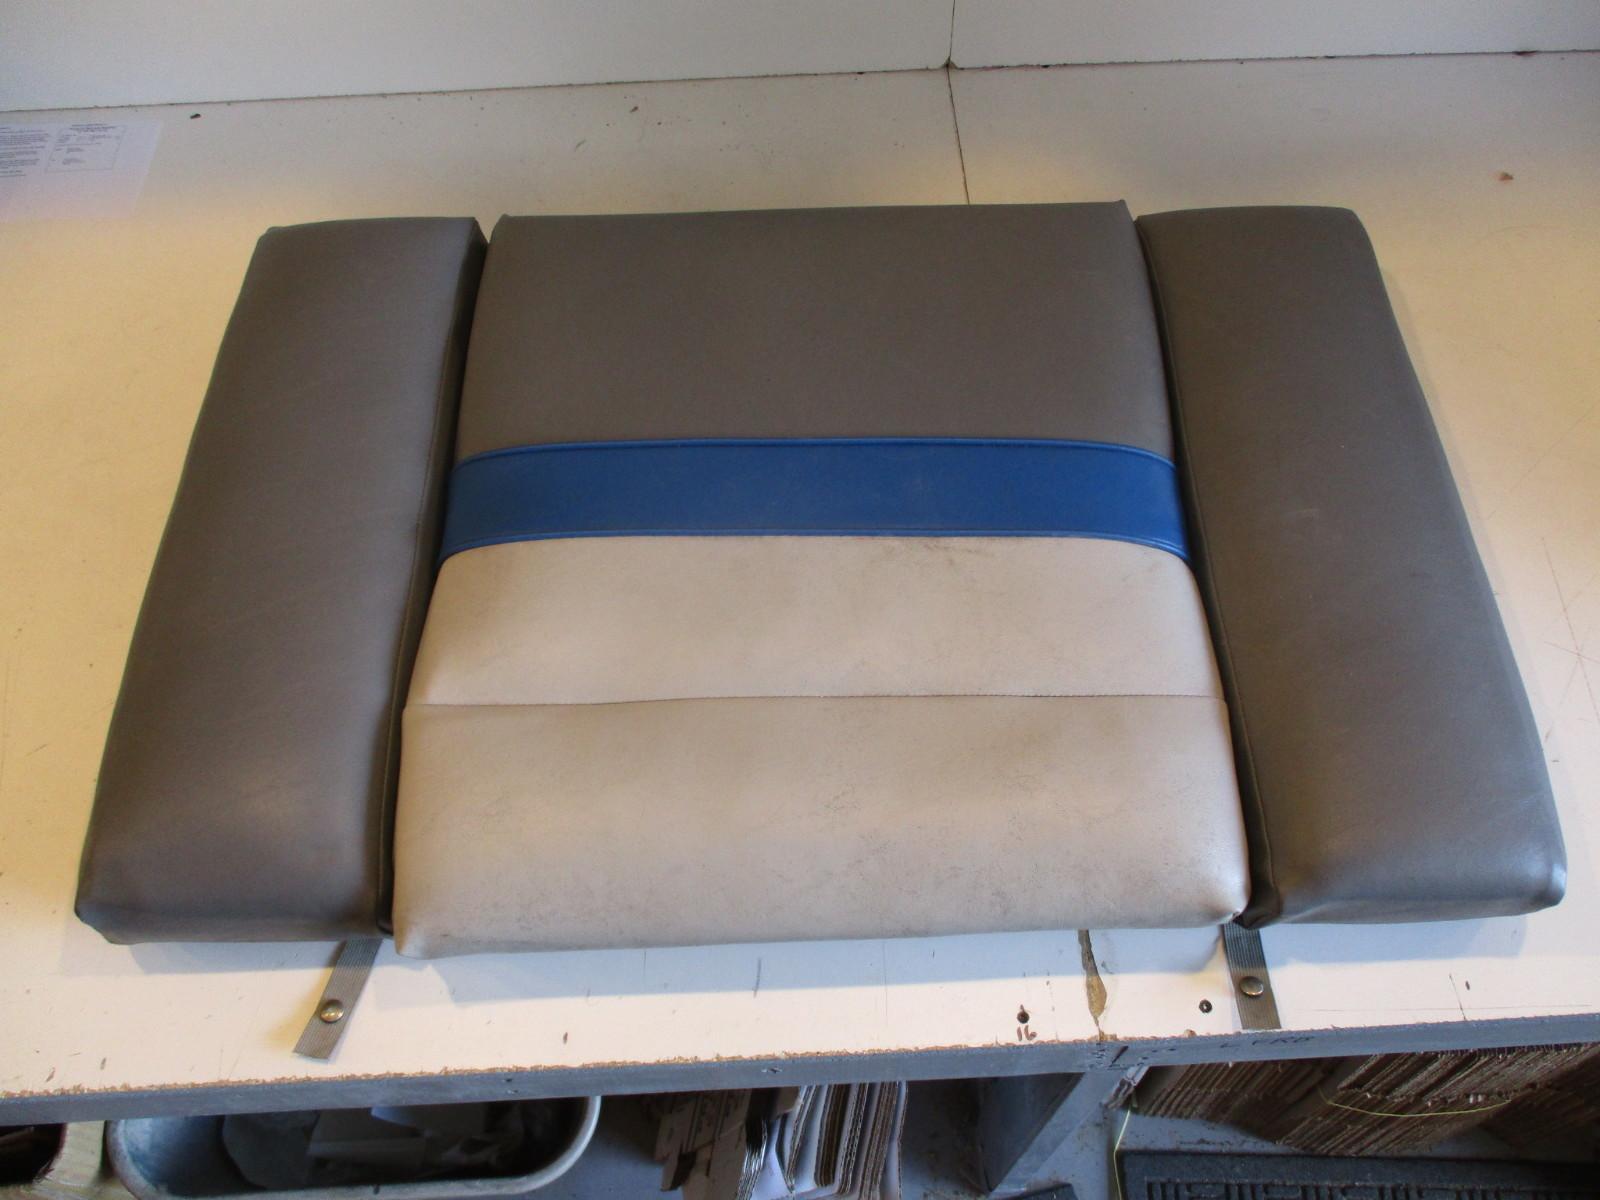 Bayliner Boat Parts Green Bay Propeller Marine Llc 1987 Capri Bowrider Wiring Diagram Rear Stern Seat Cushion Grey Blue 385